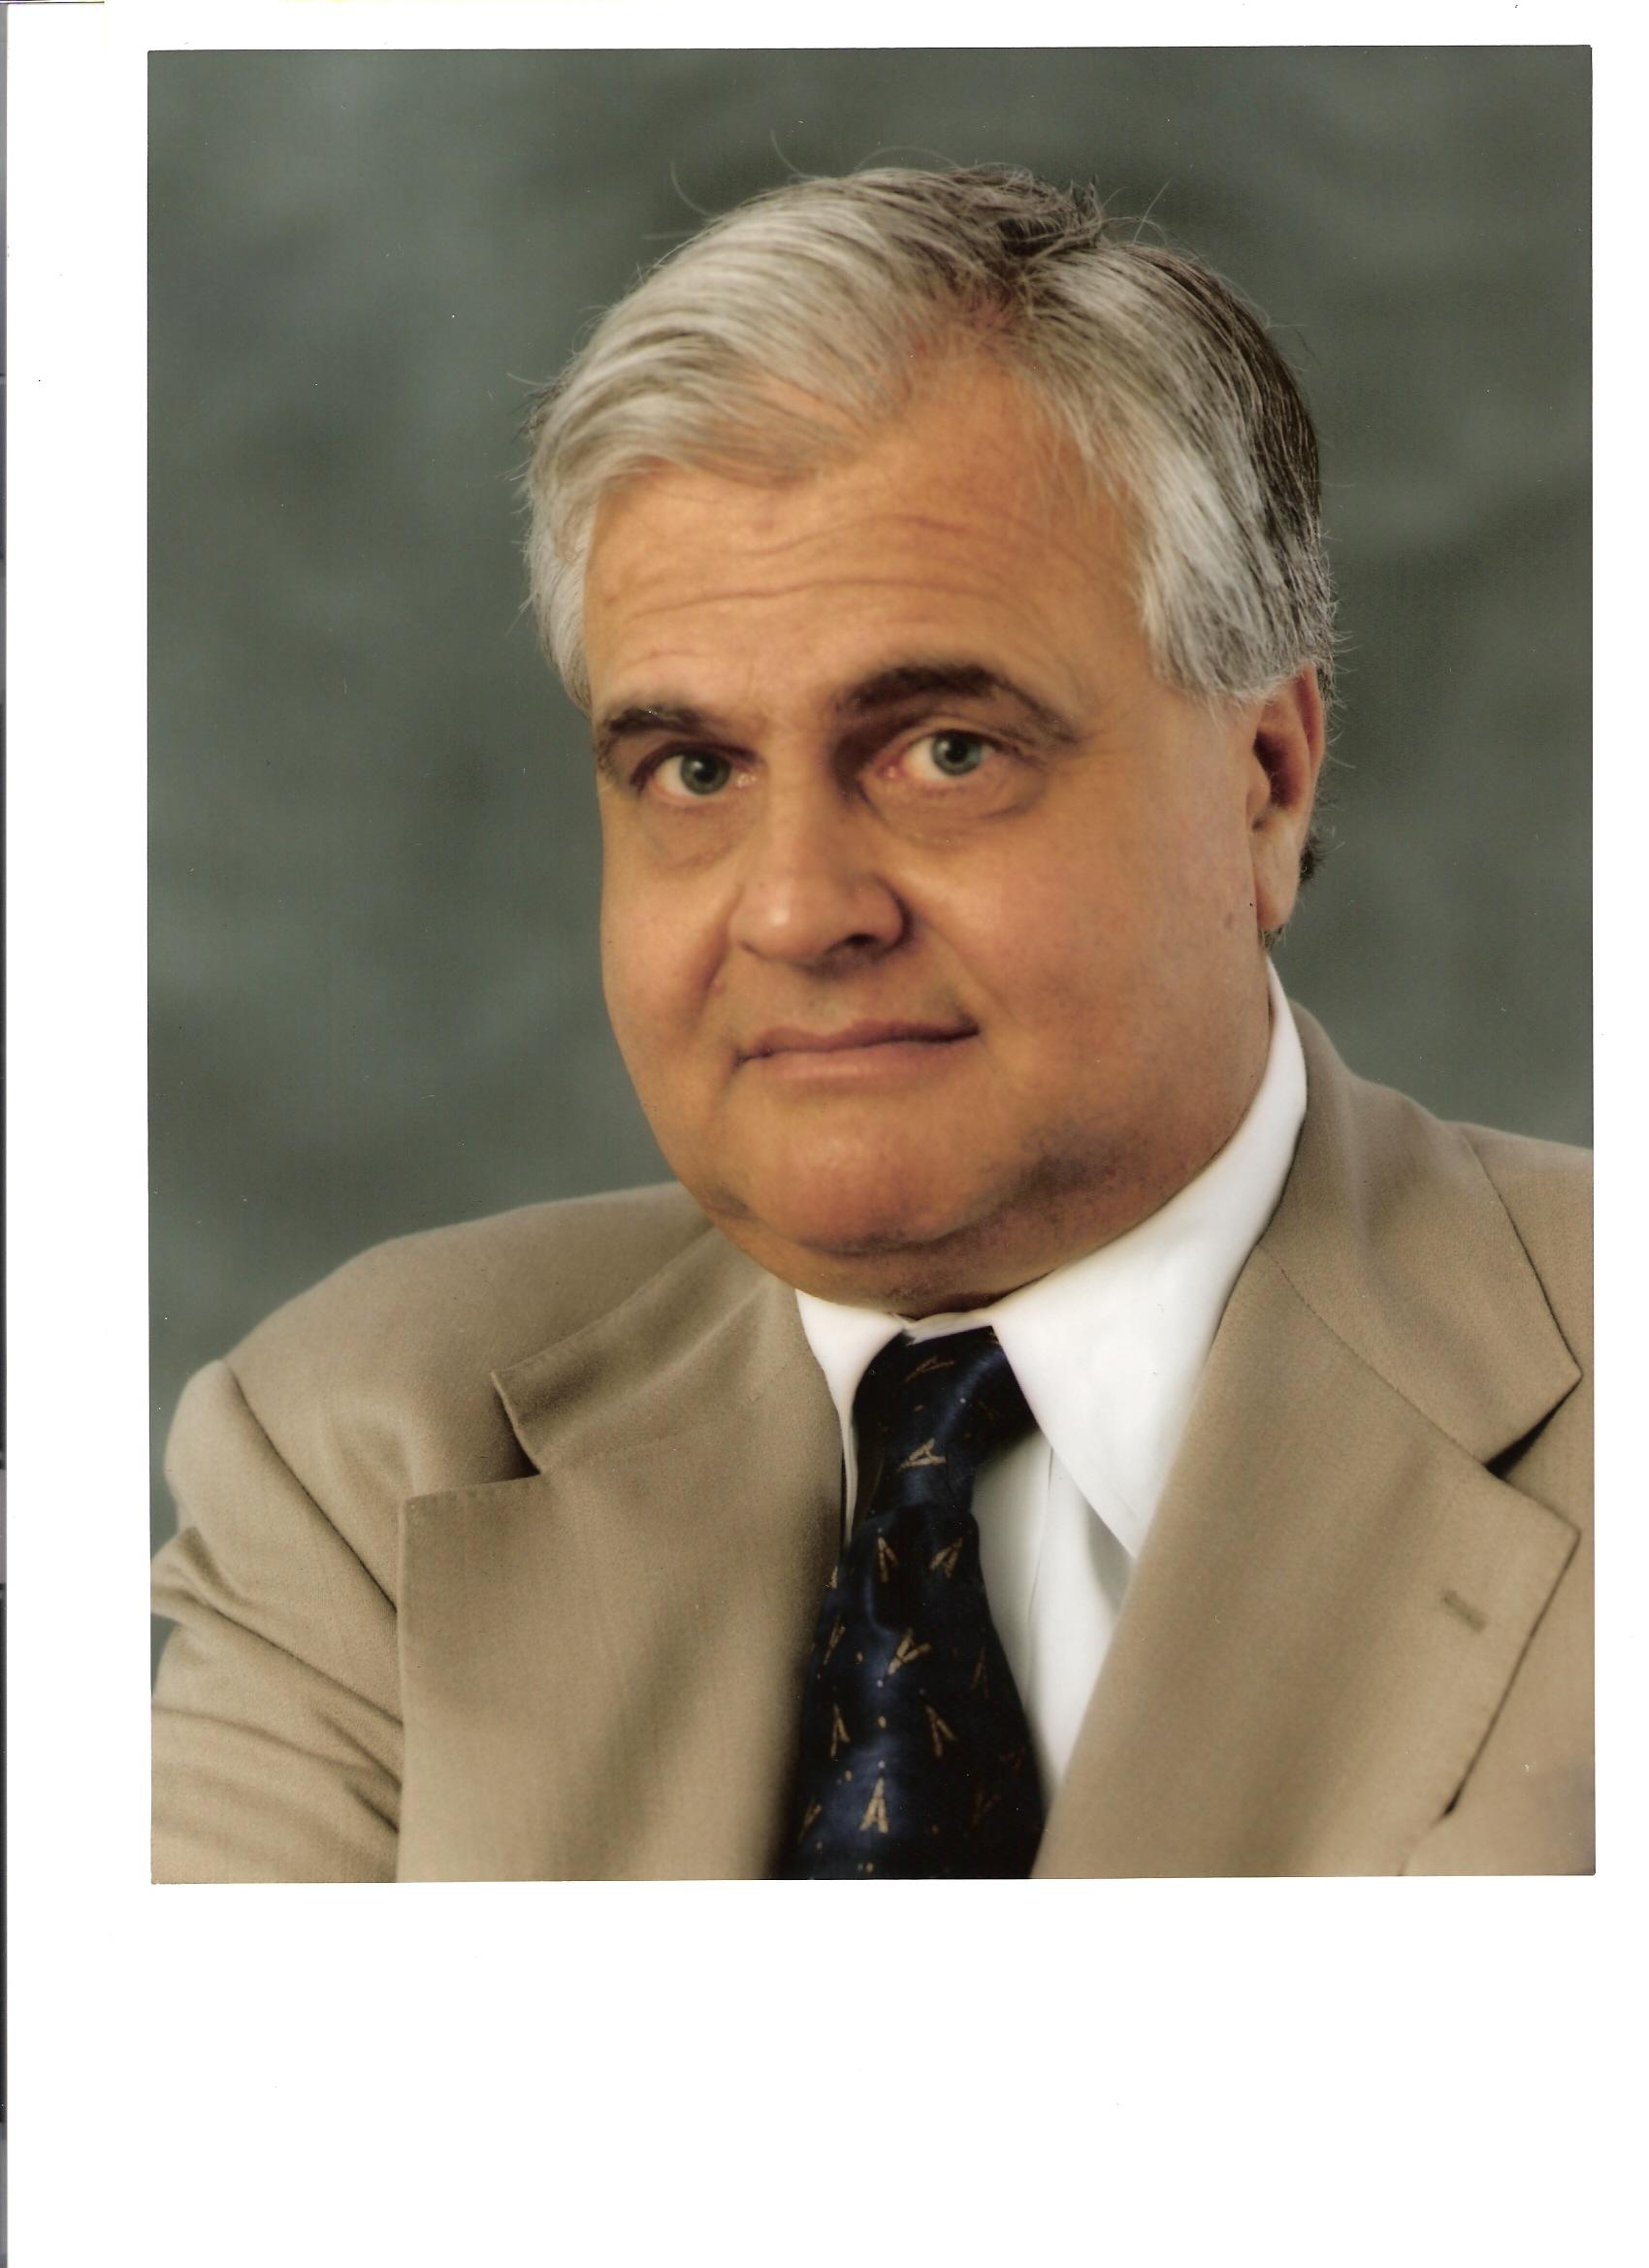 John E. Marszalek - Attorney at Law